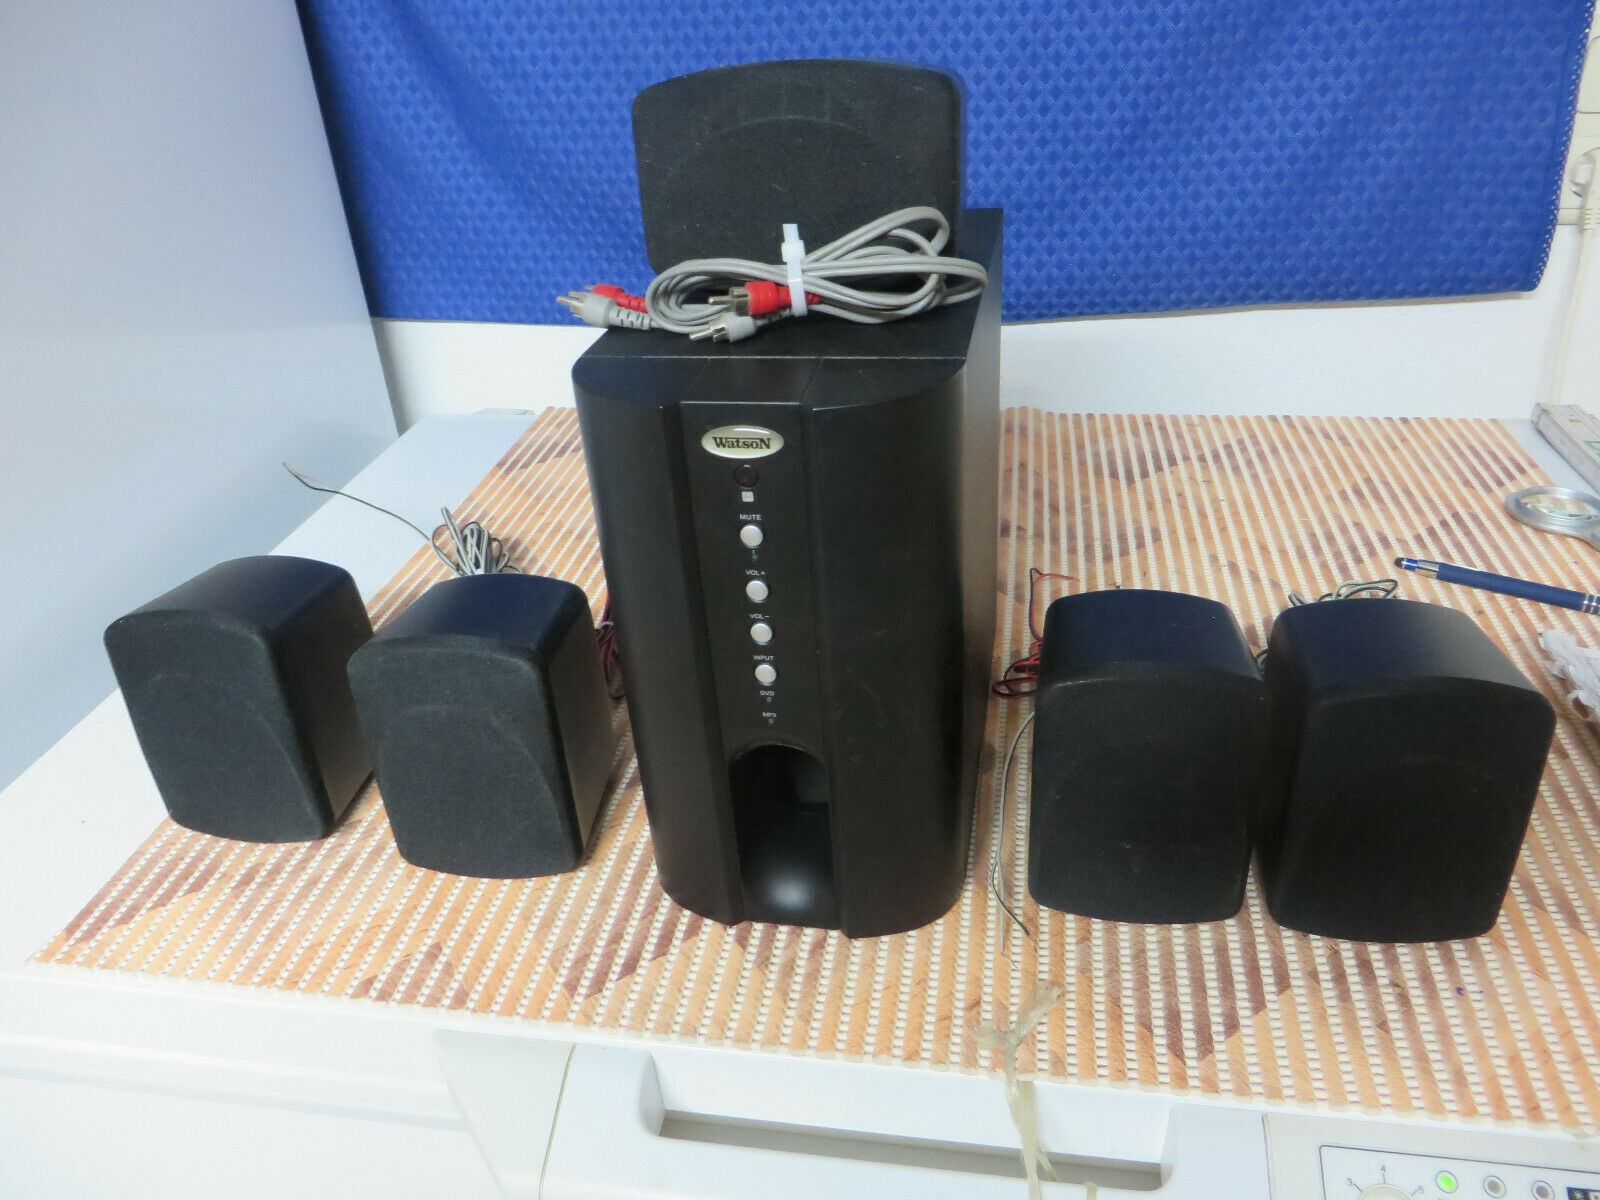 Watson 5.1 Soundsystem AS6502